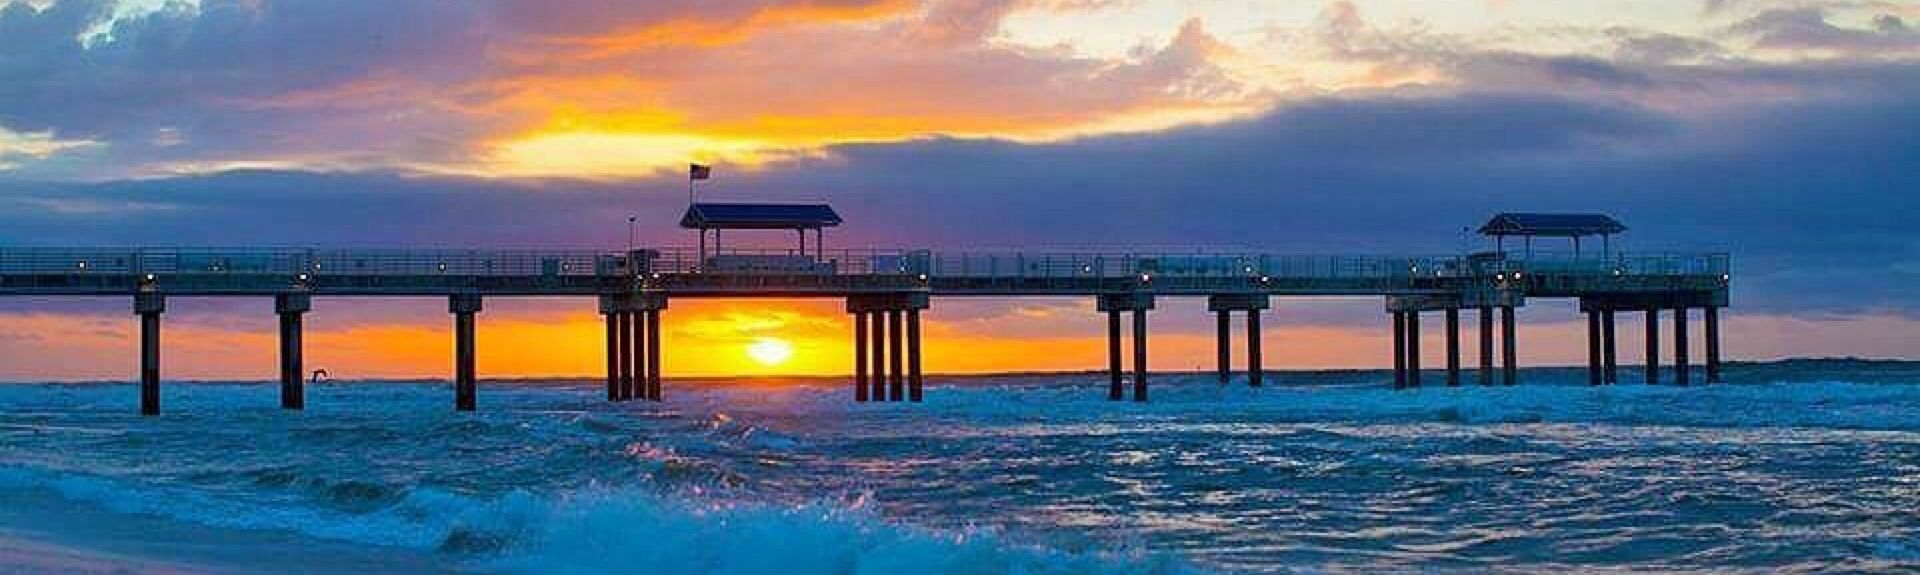 Grand Beach Condominiums, Gulf Shores, AL, USA